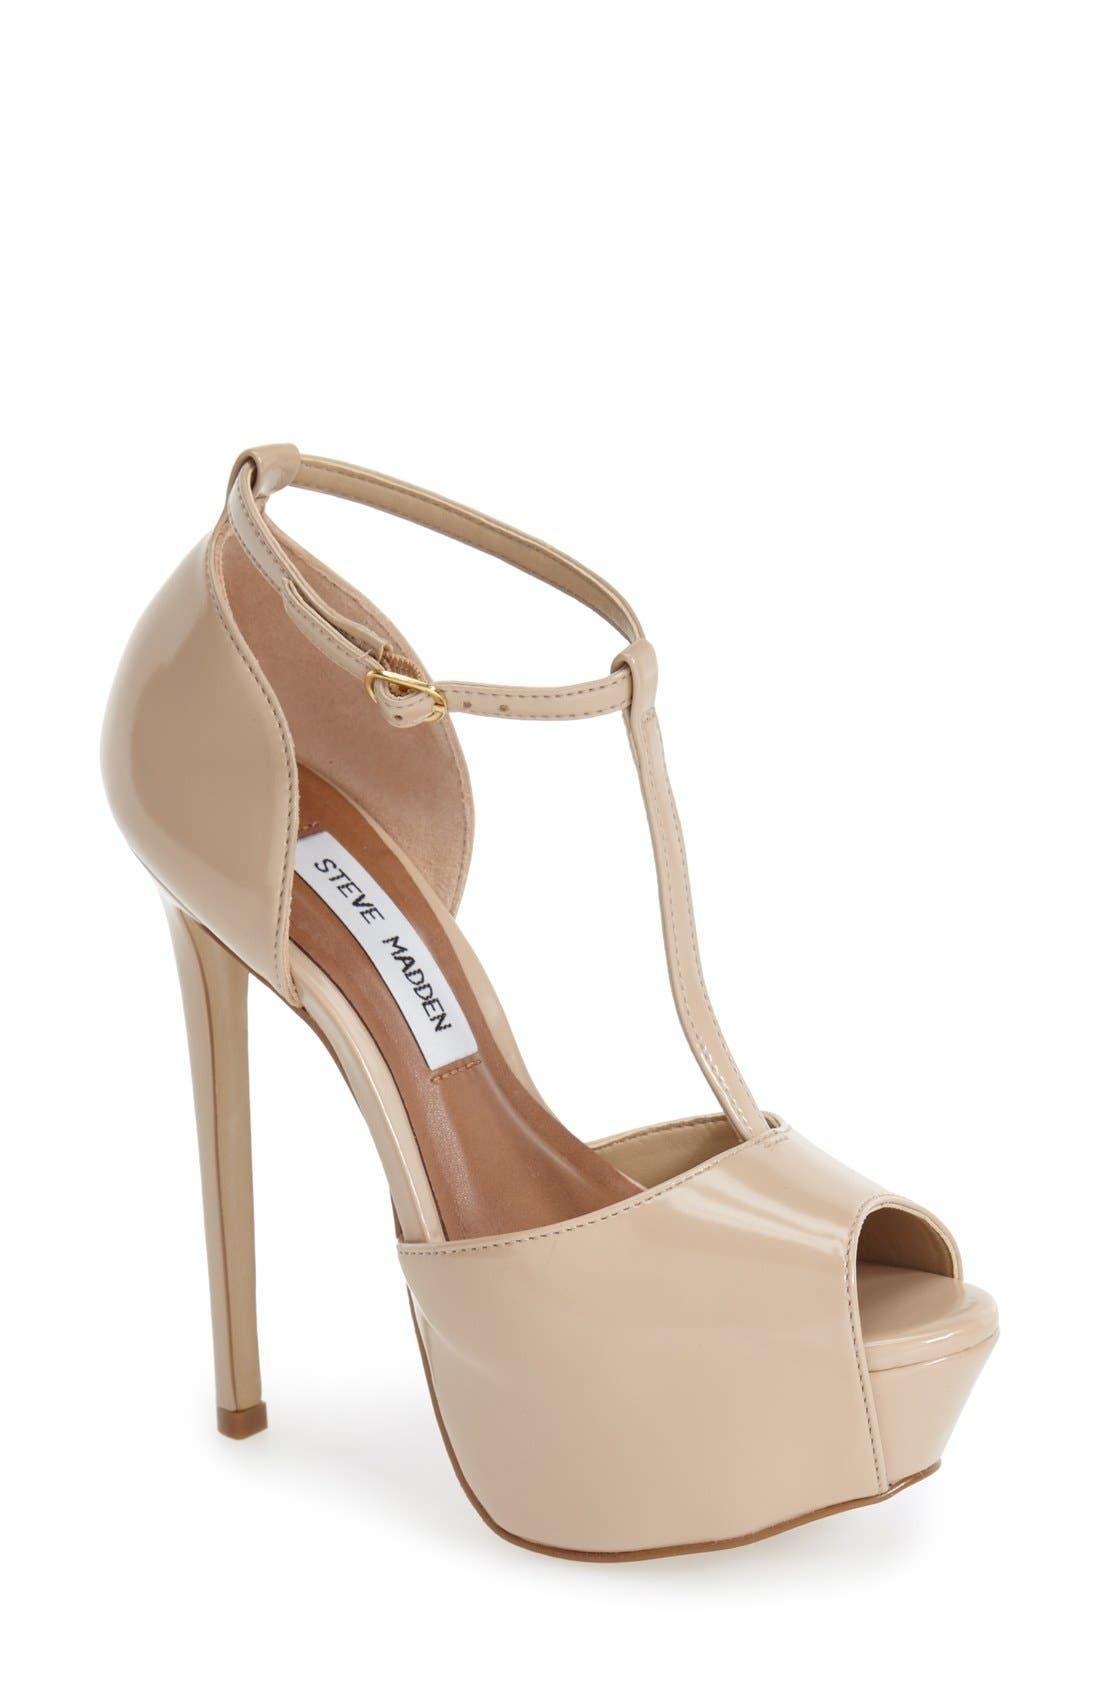 Alternate Image 1 Selected - Steve Madden 'Kriminal' T-Strap Platform Sandal (Women)